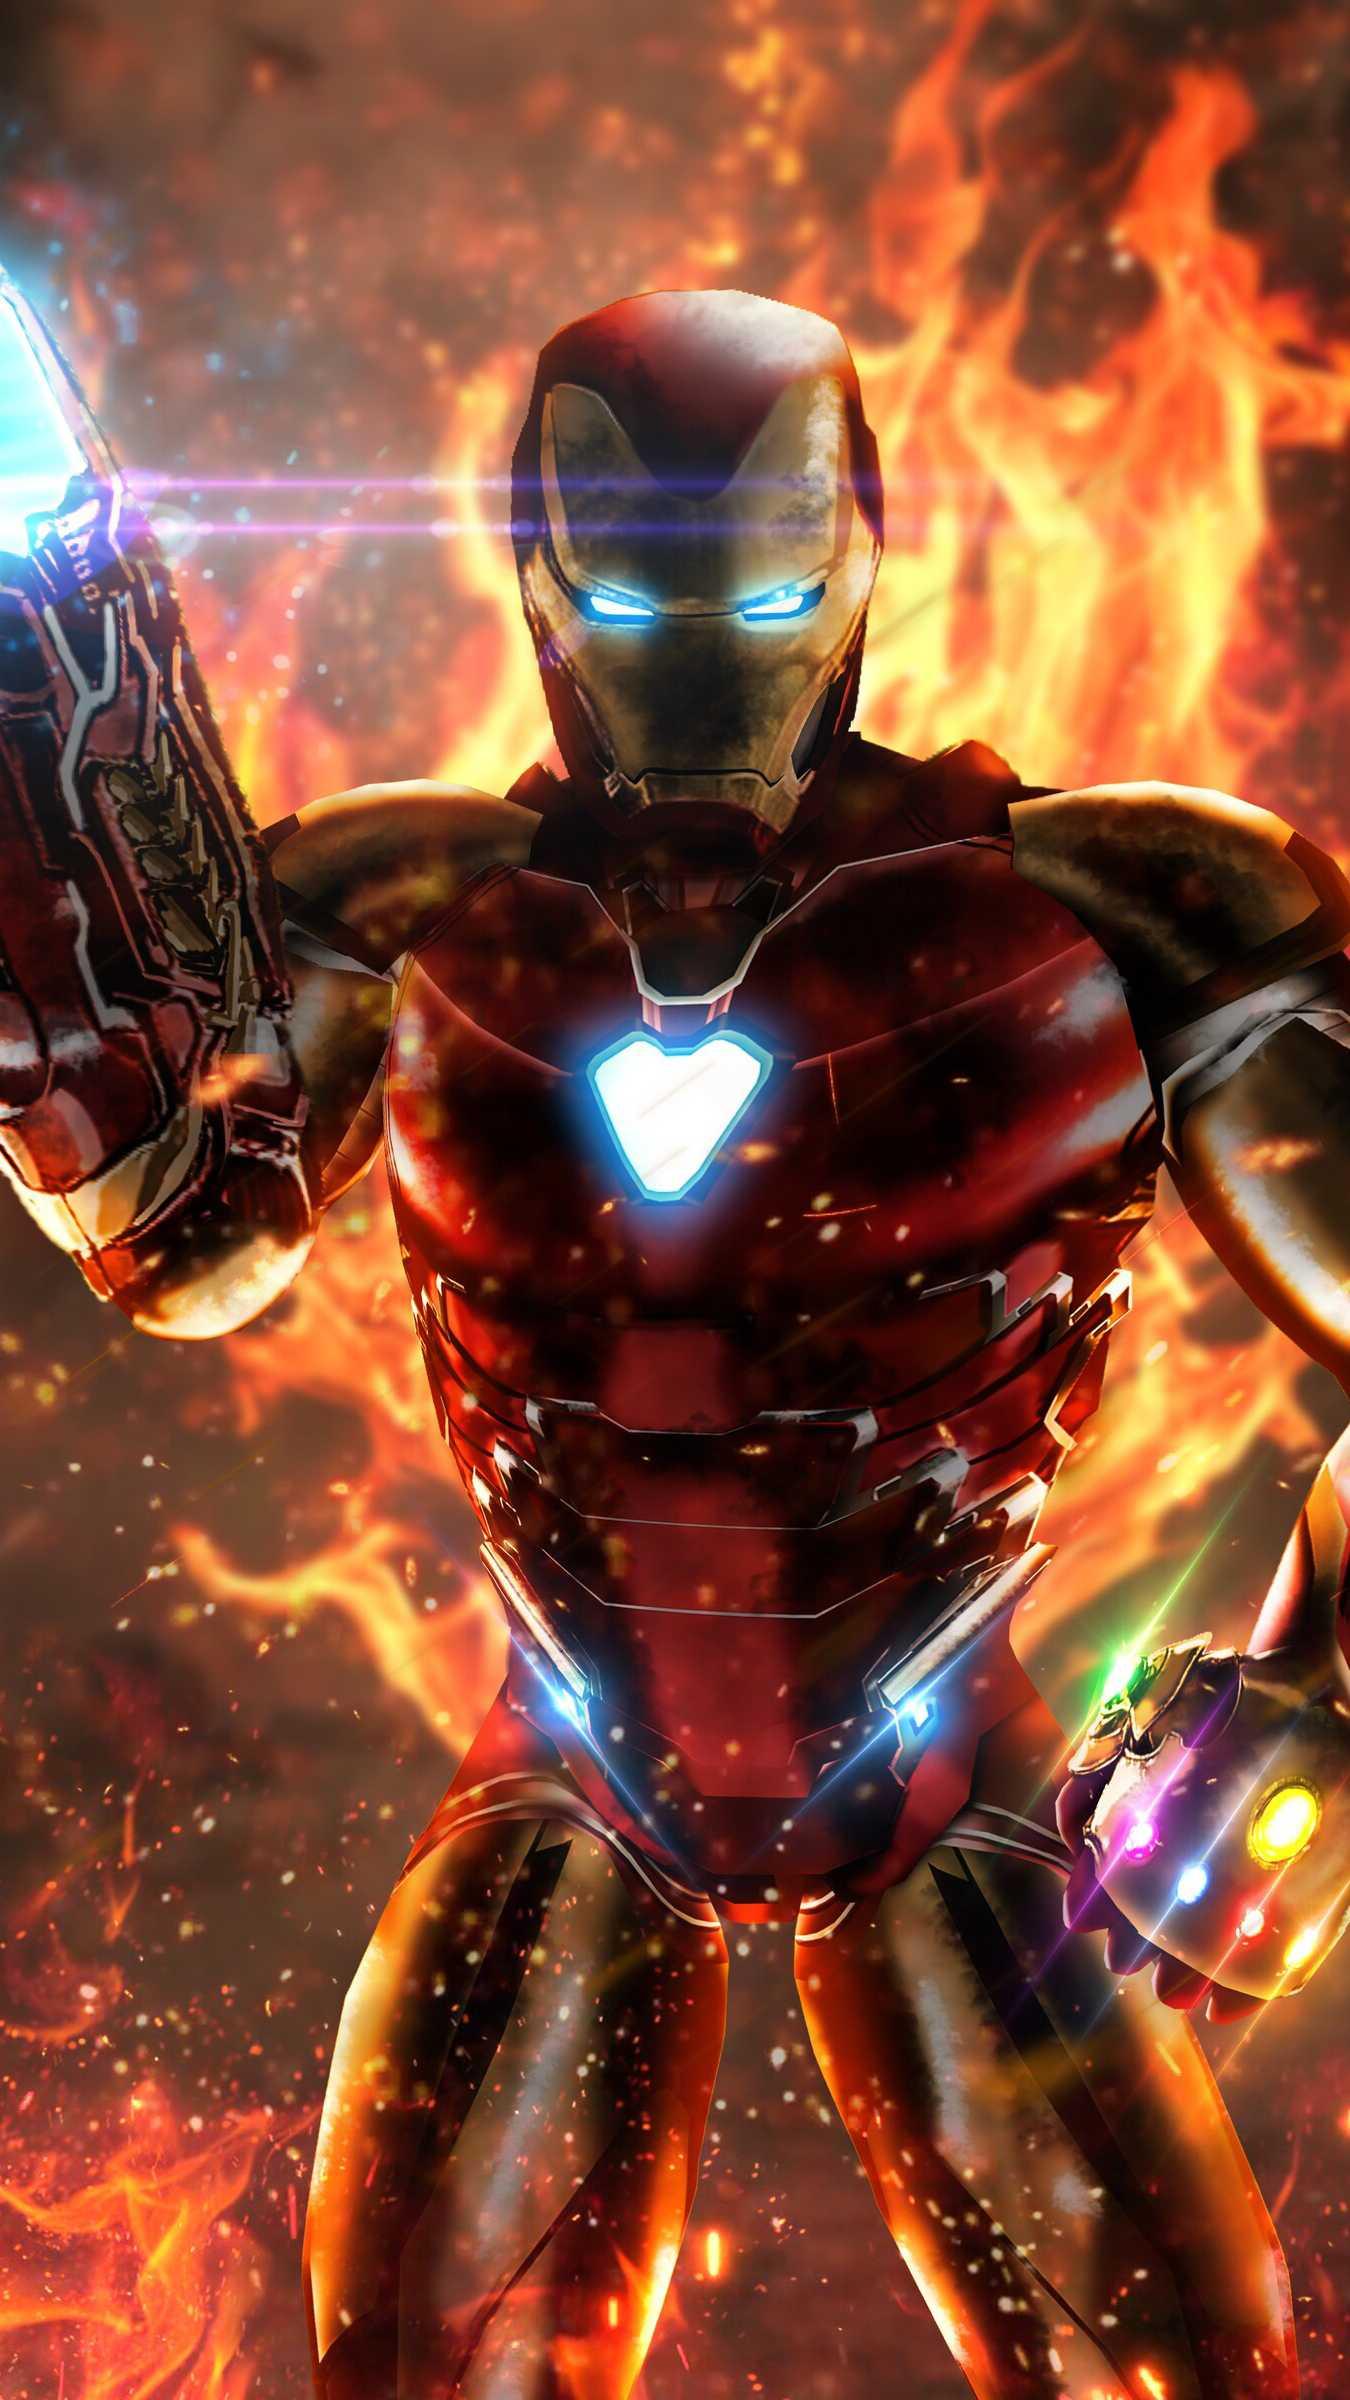 Iron Man Infinity Stone Weapon iPhone Wallpaper